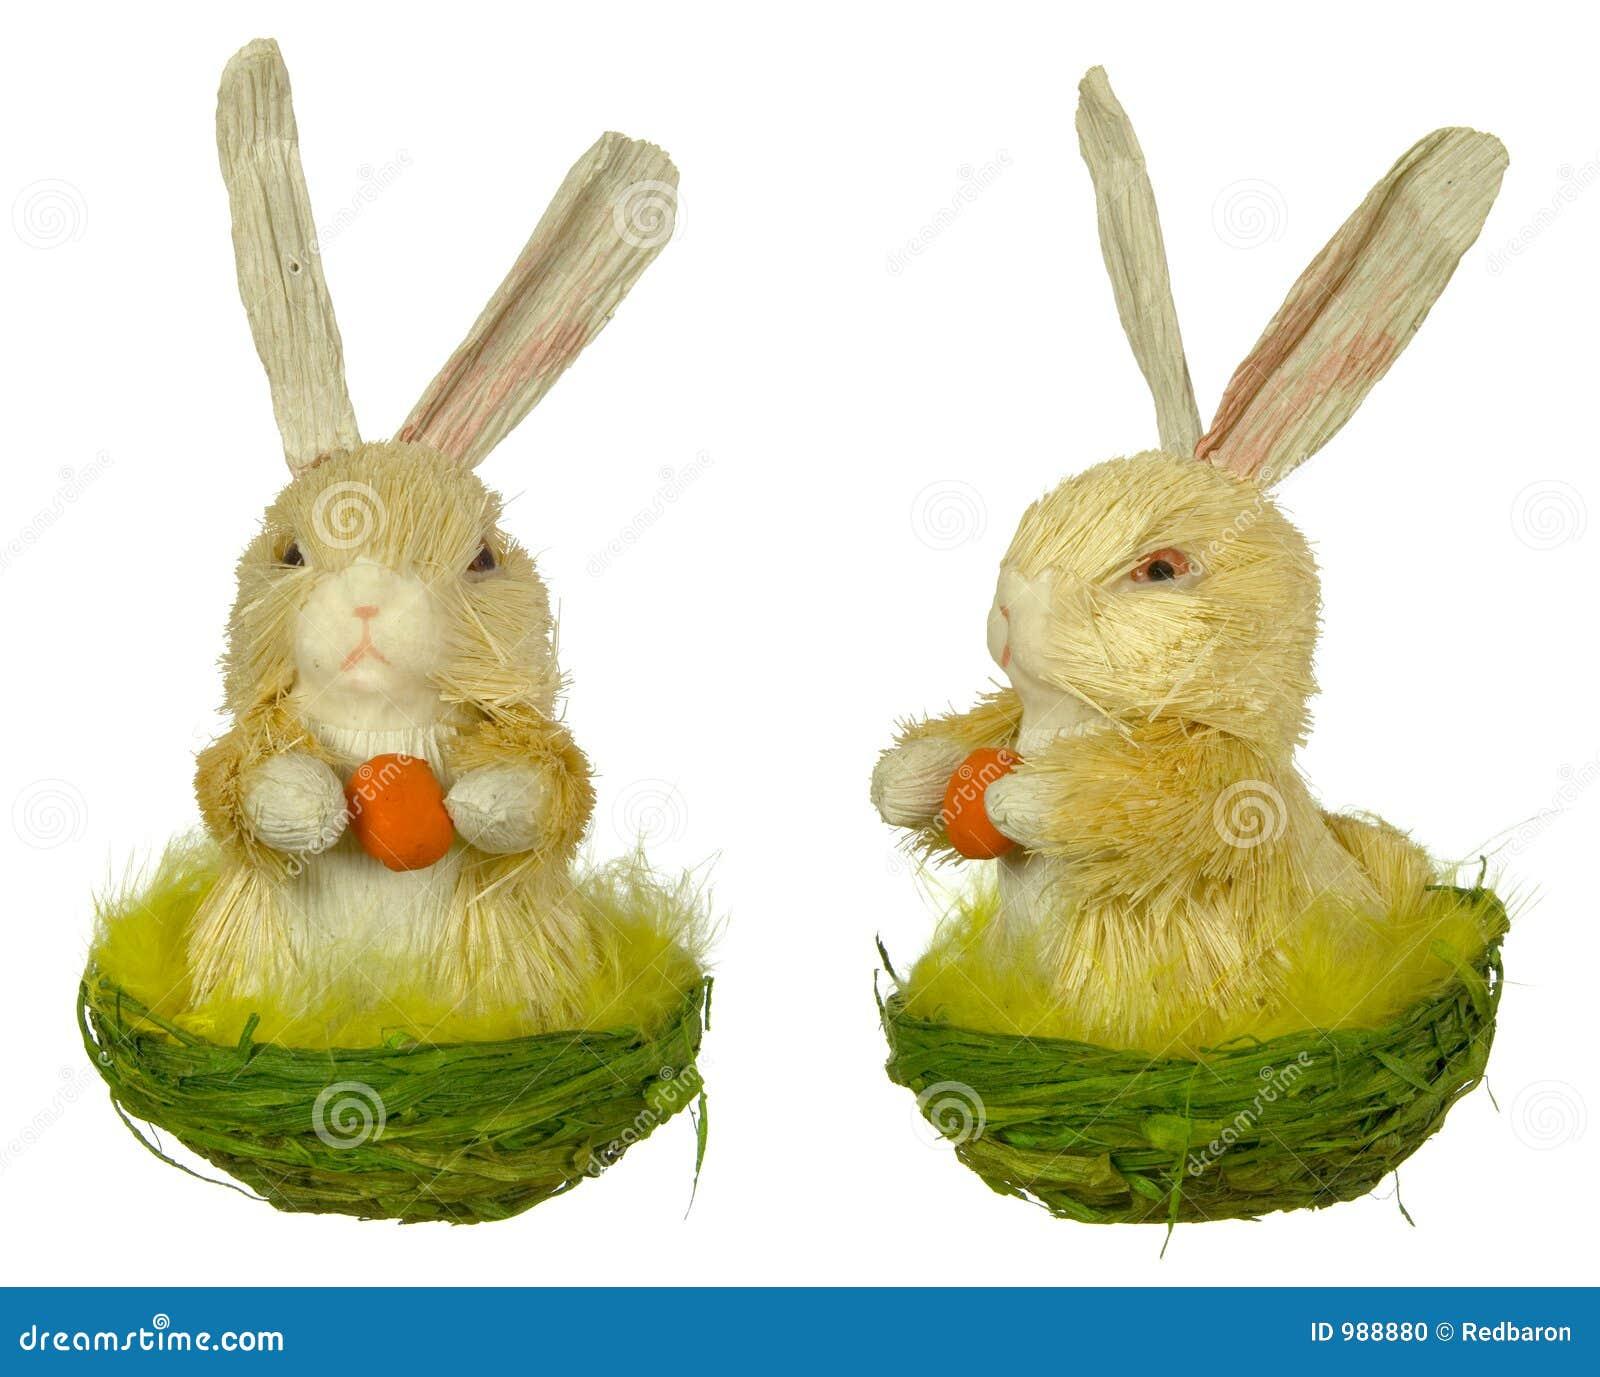 Kanineaster hare